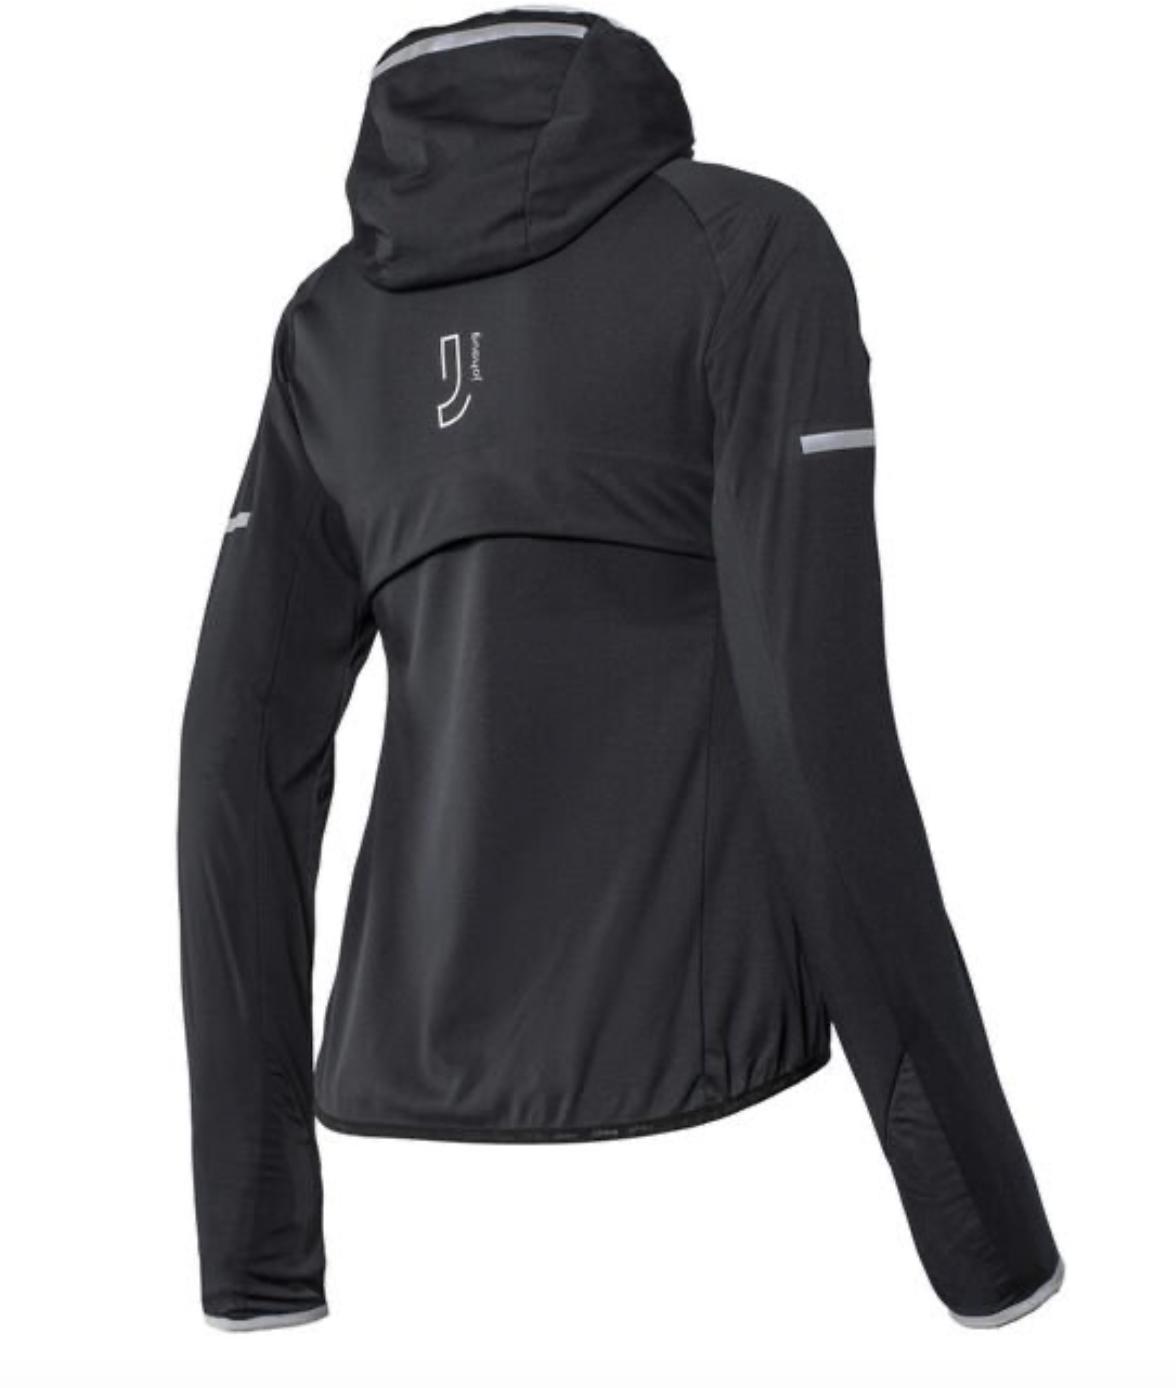 Bilde av Johaug  Concept Jacket TBlack